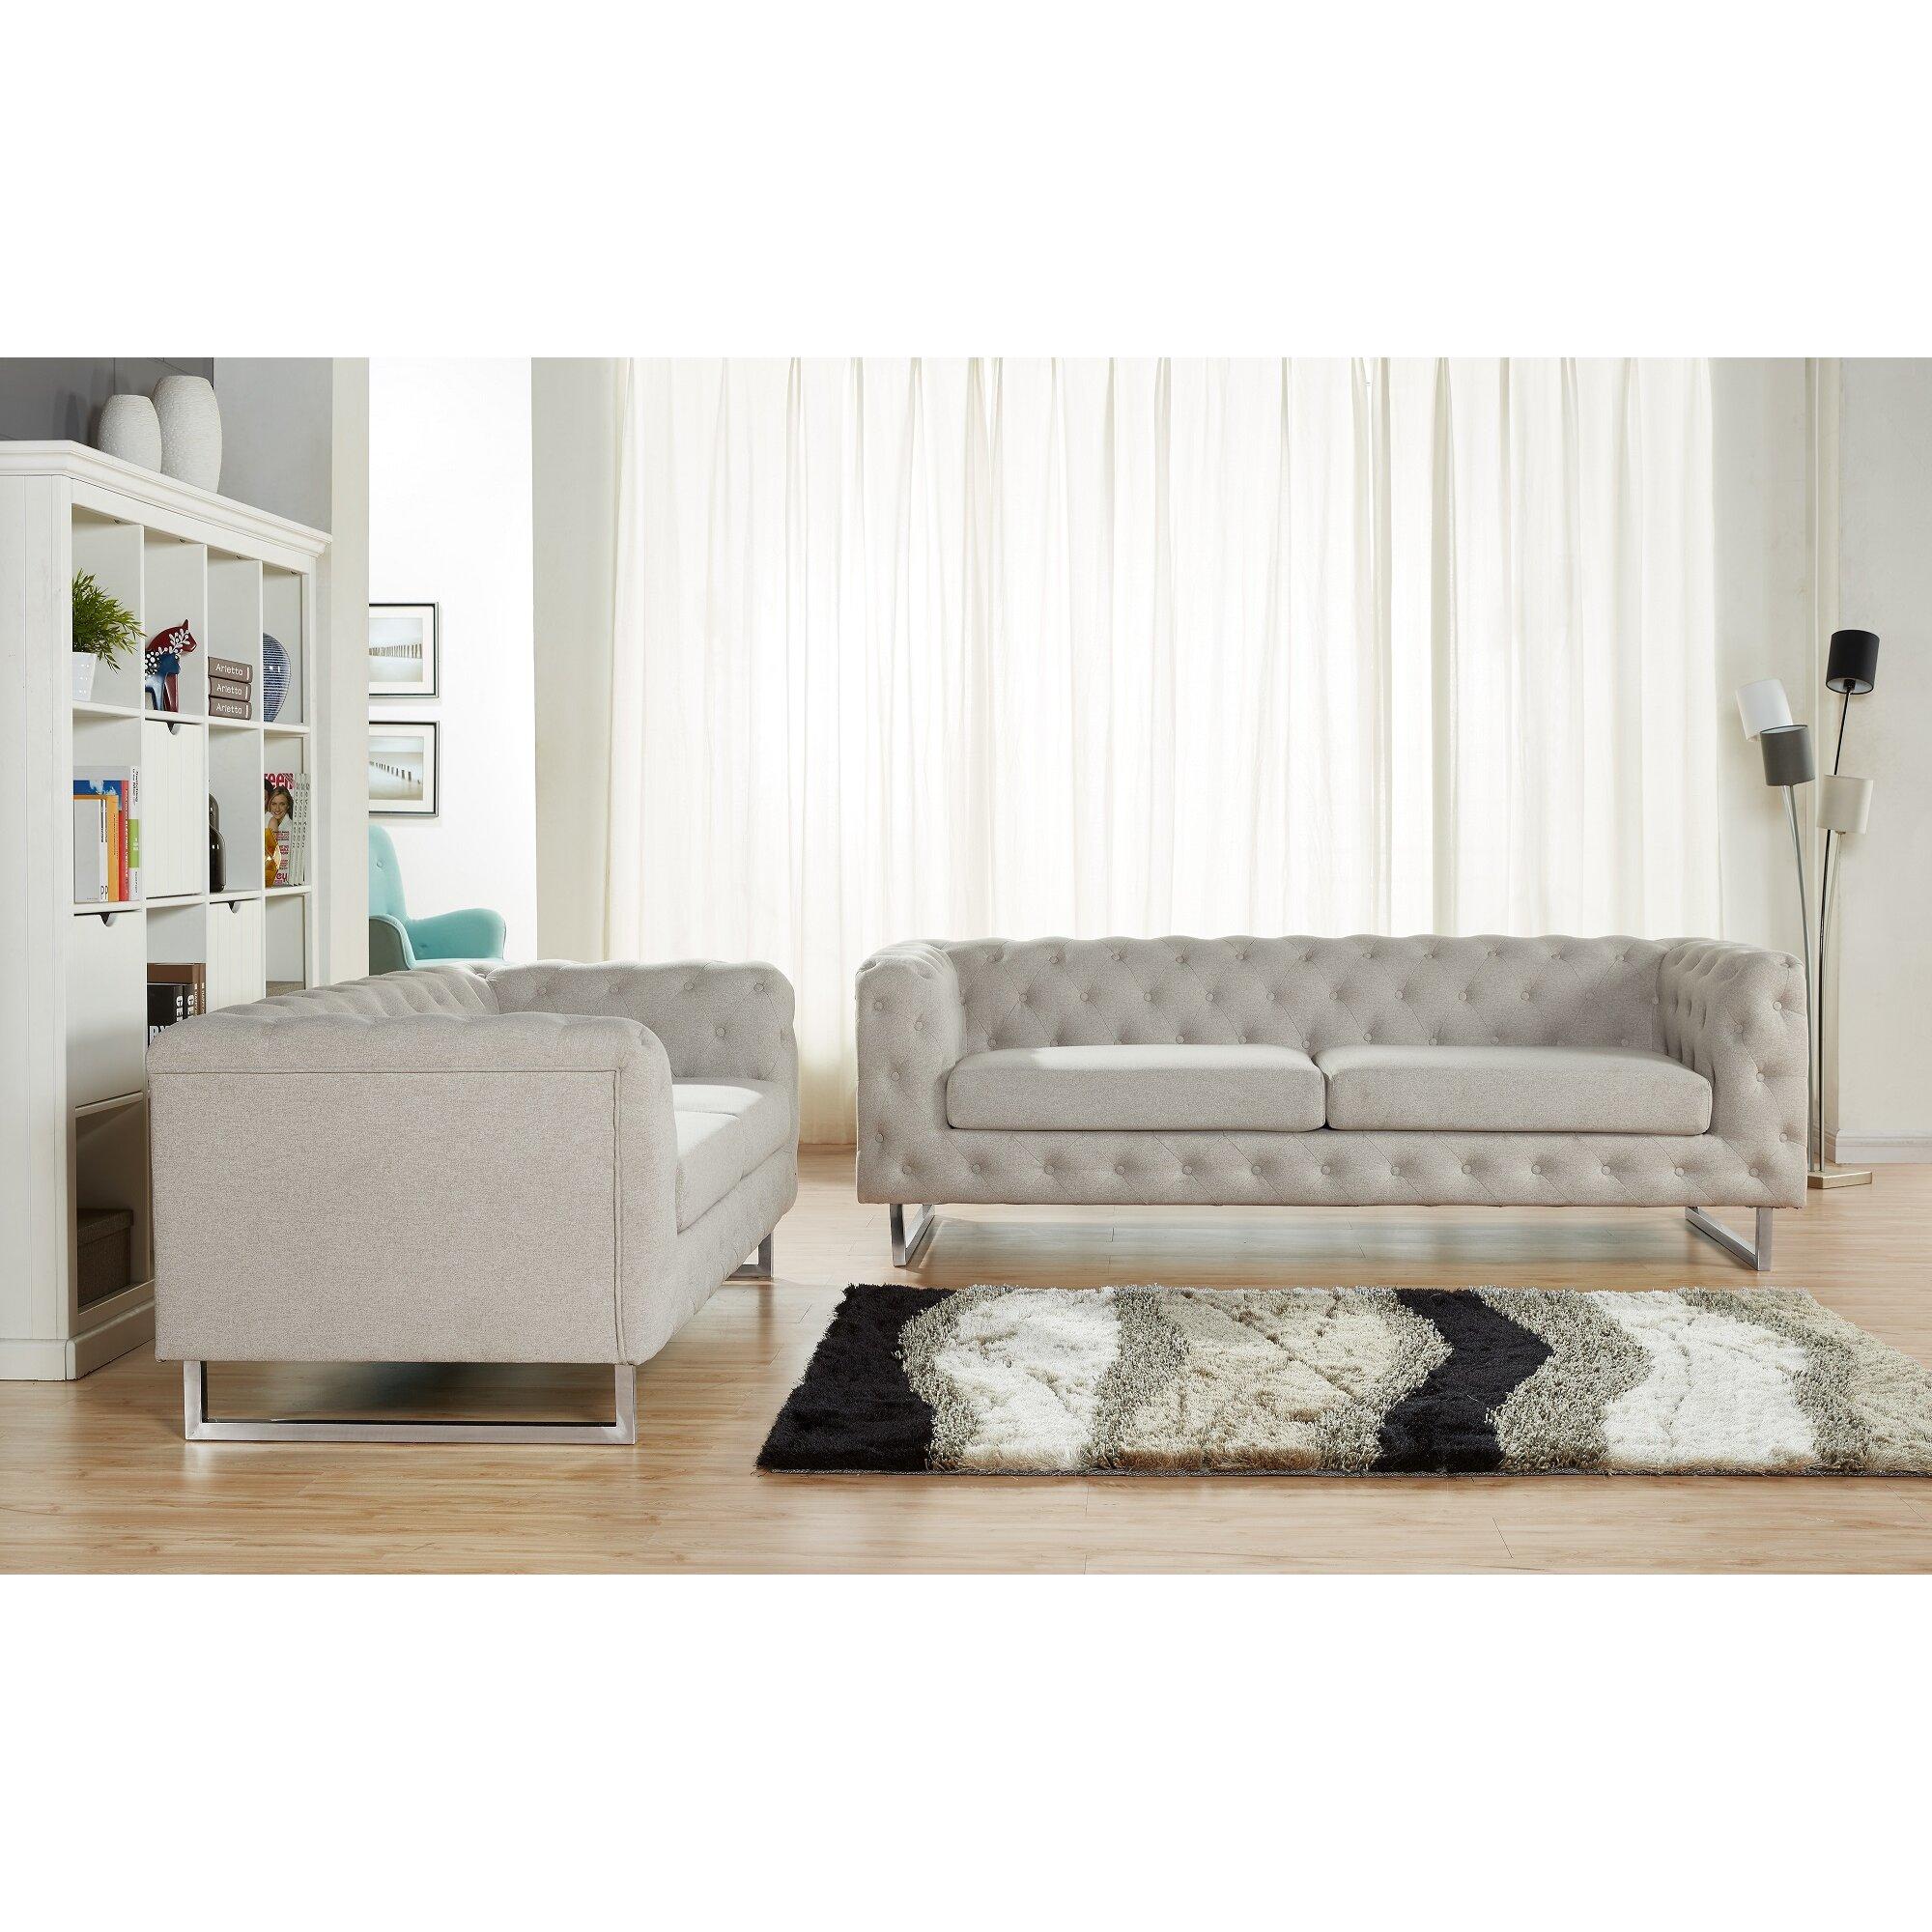 Container scroll 2 piece modern linen fabric sofa set for 2 piece sofa set